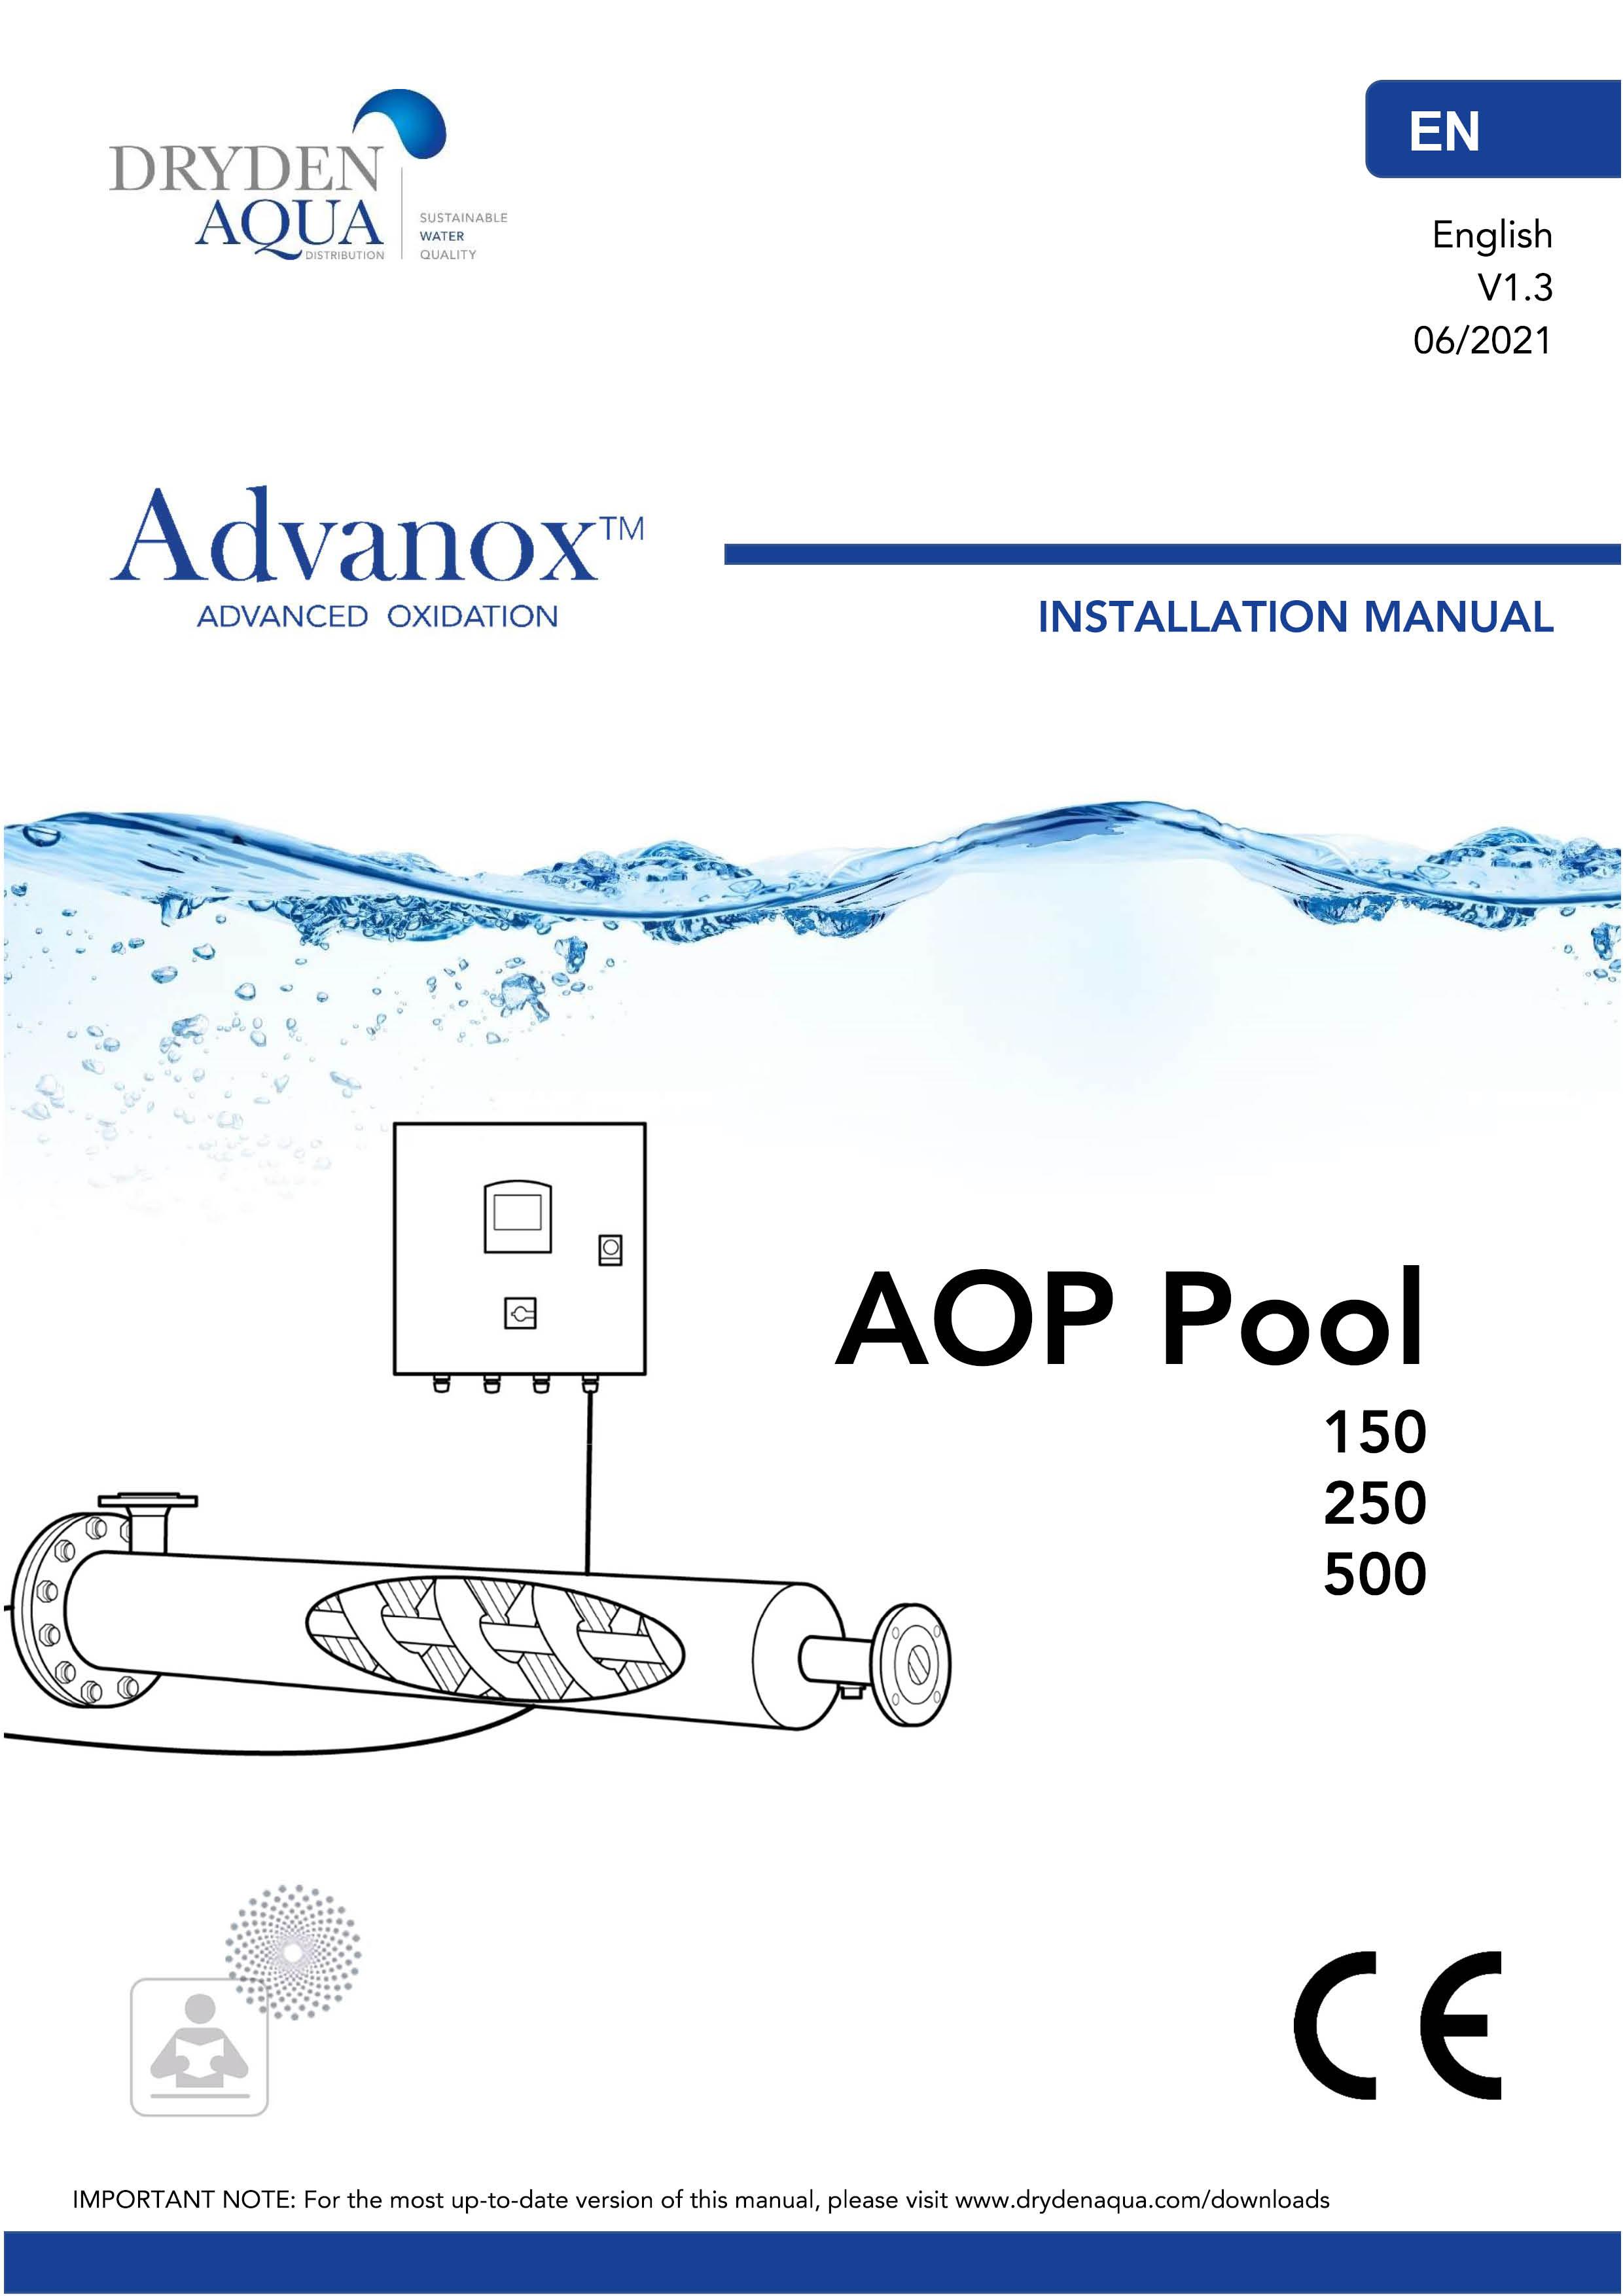 Advanox Manual English